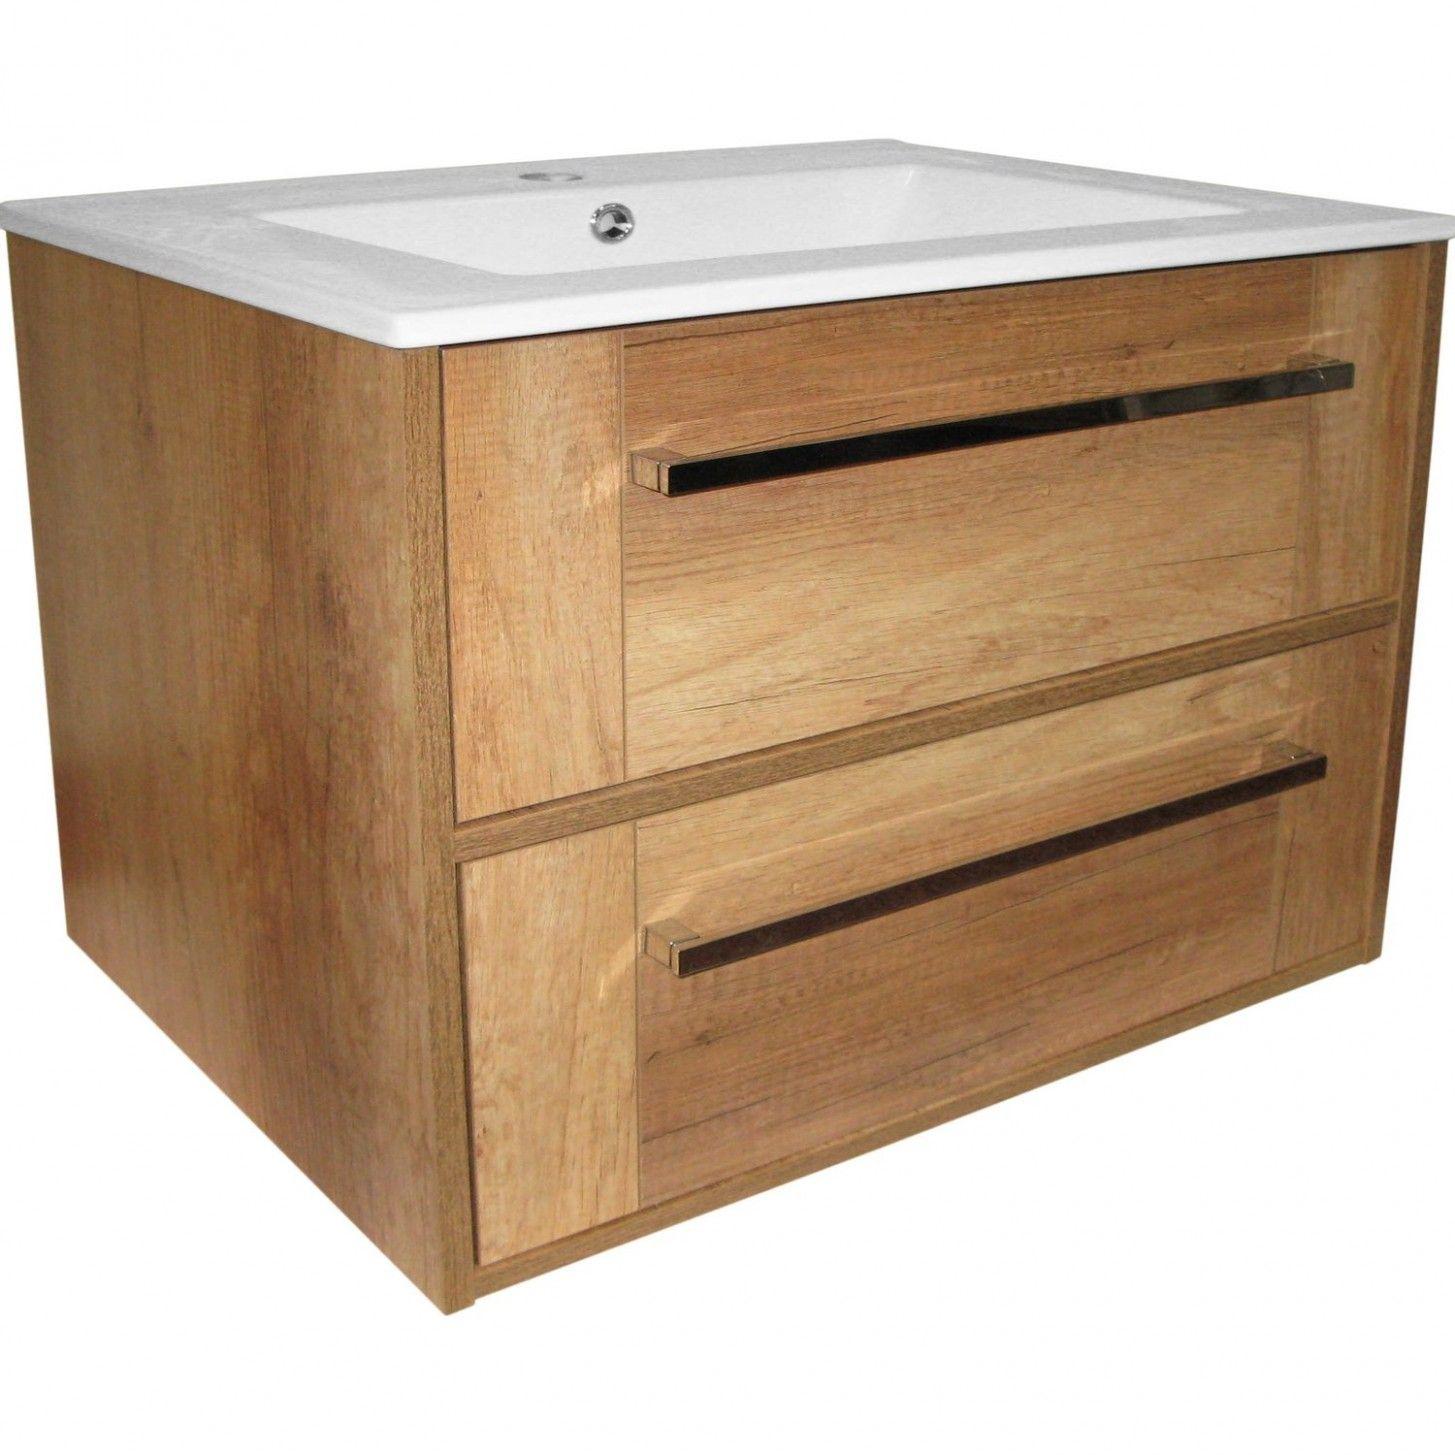 8 Galerie Idea Koupelnovy Nabytek Baumax Decor Furniture Home